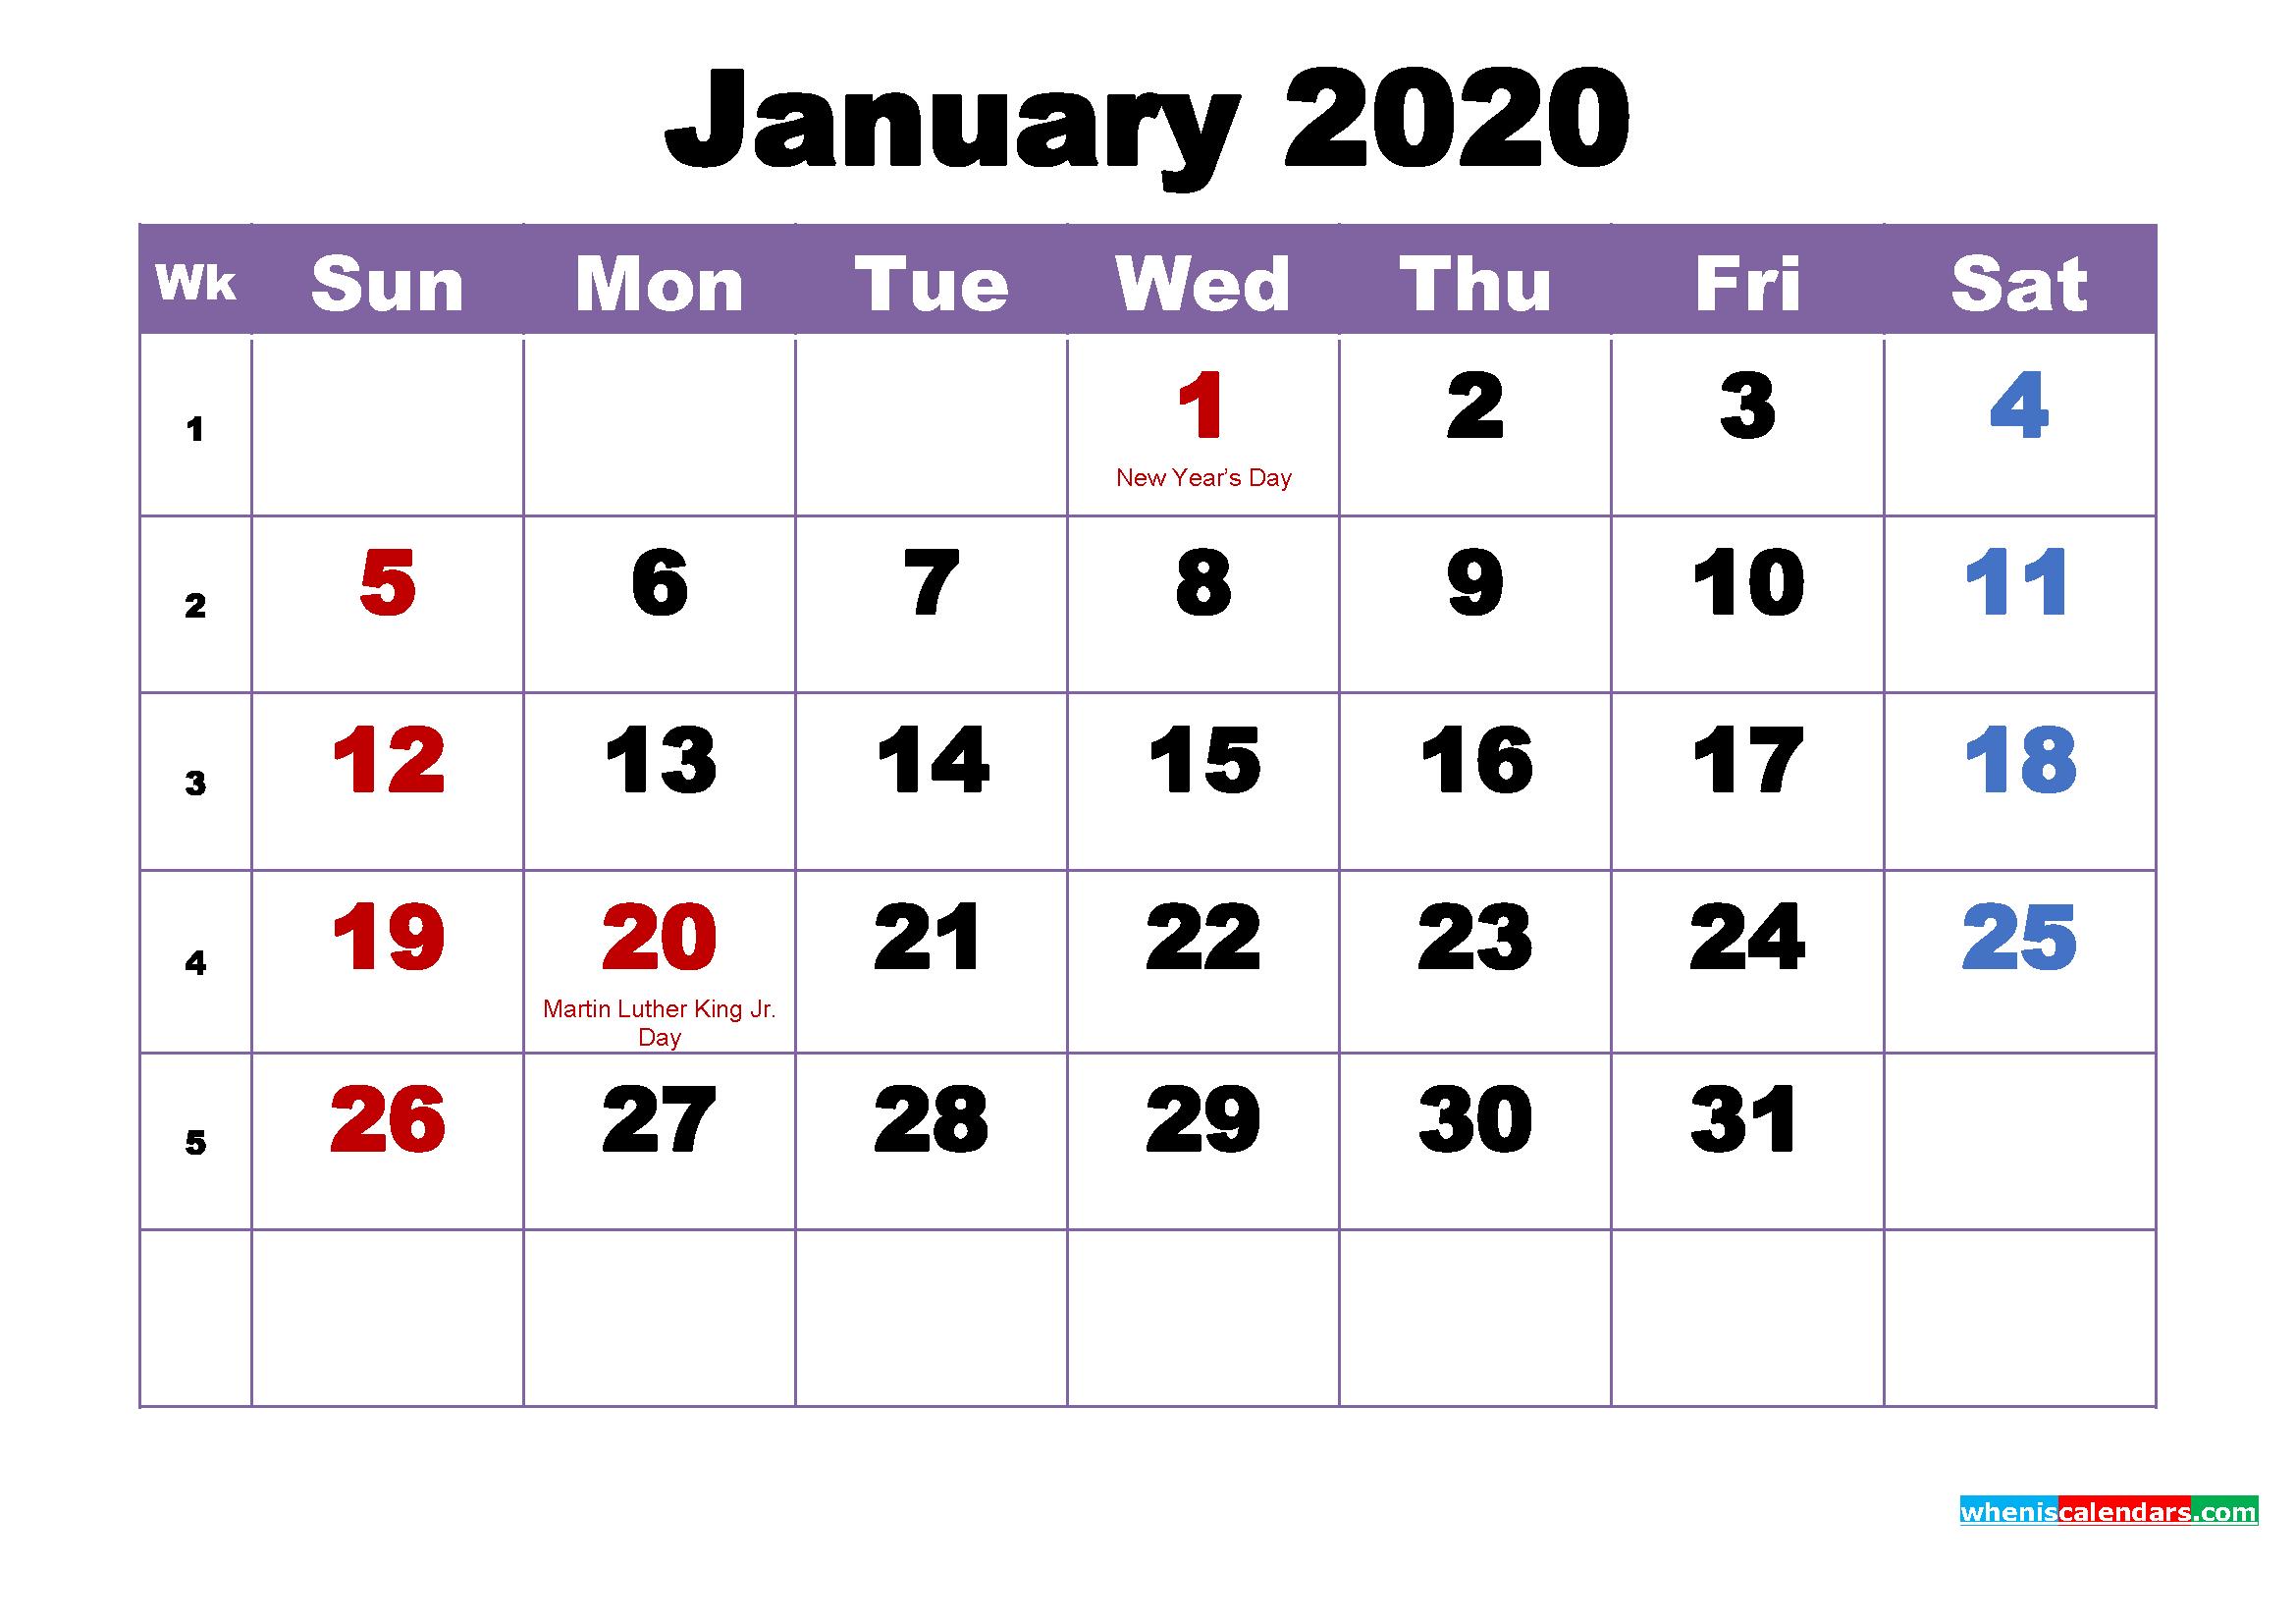 January 2020 Desktop Calendar Monthly